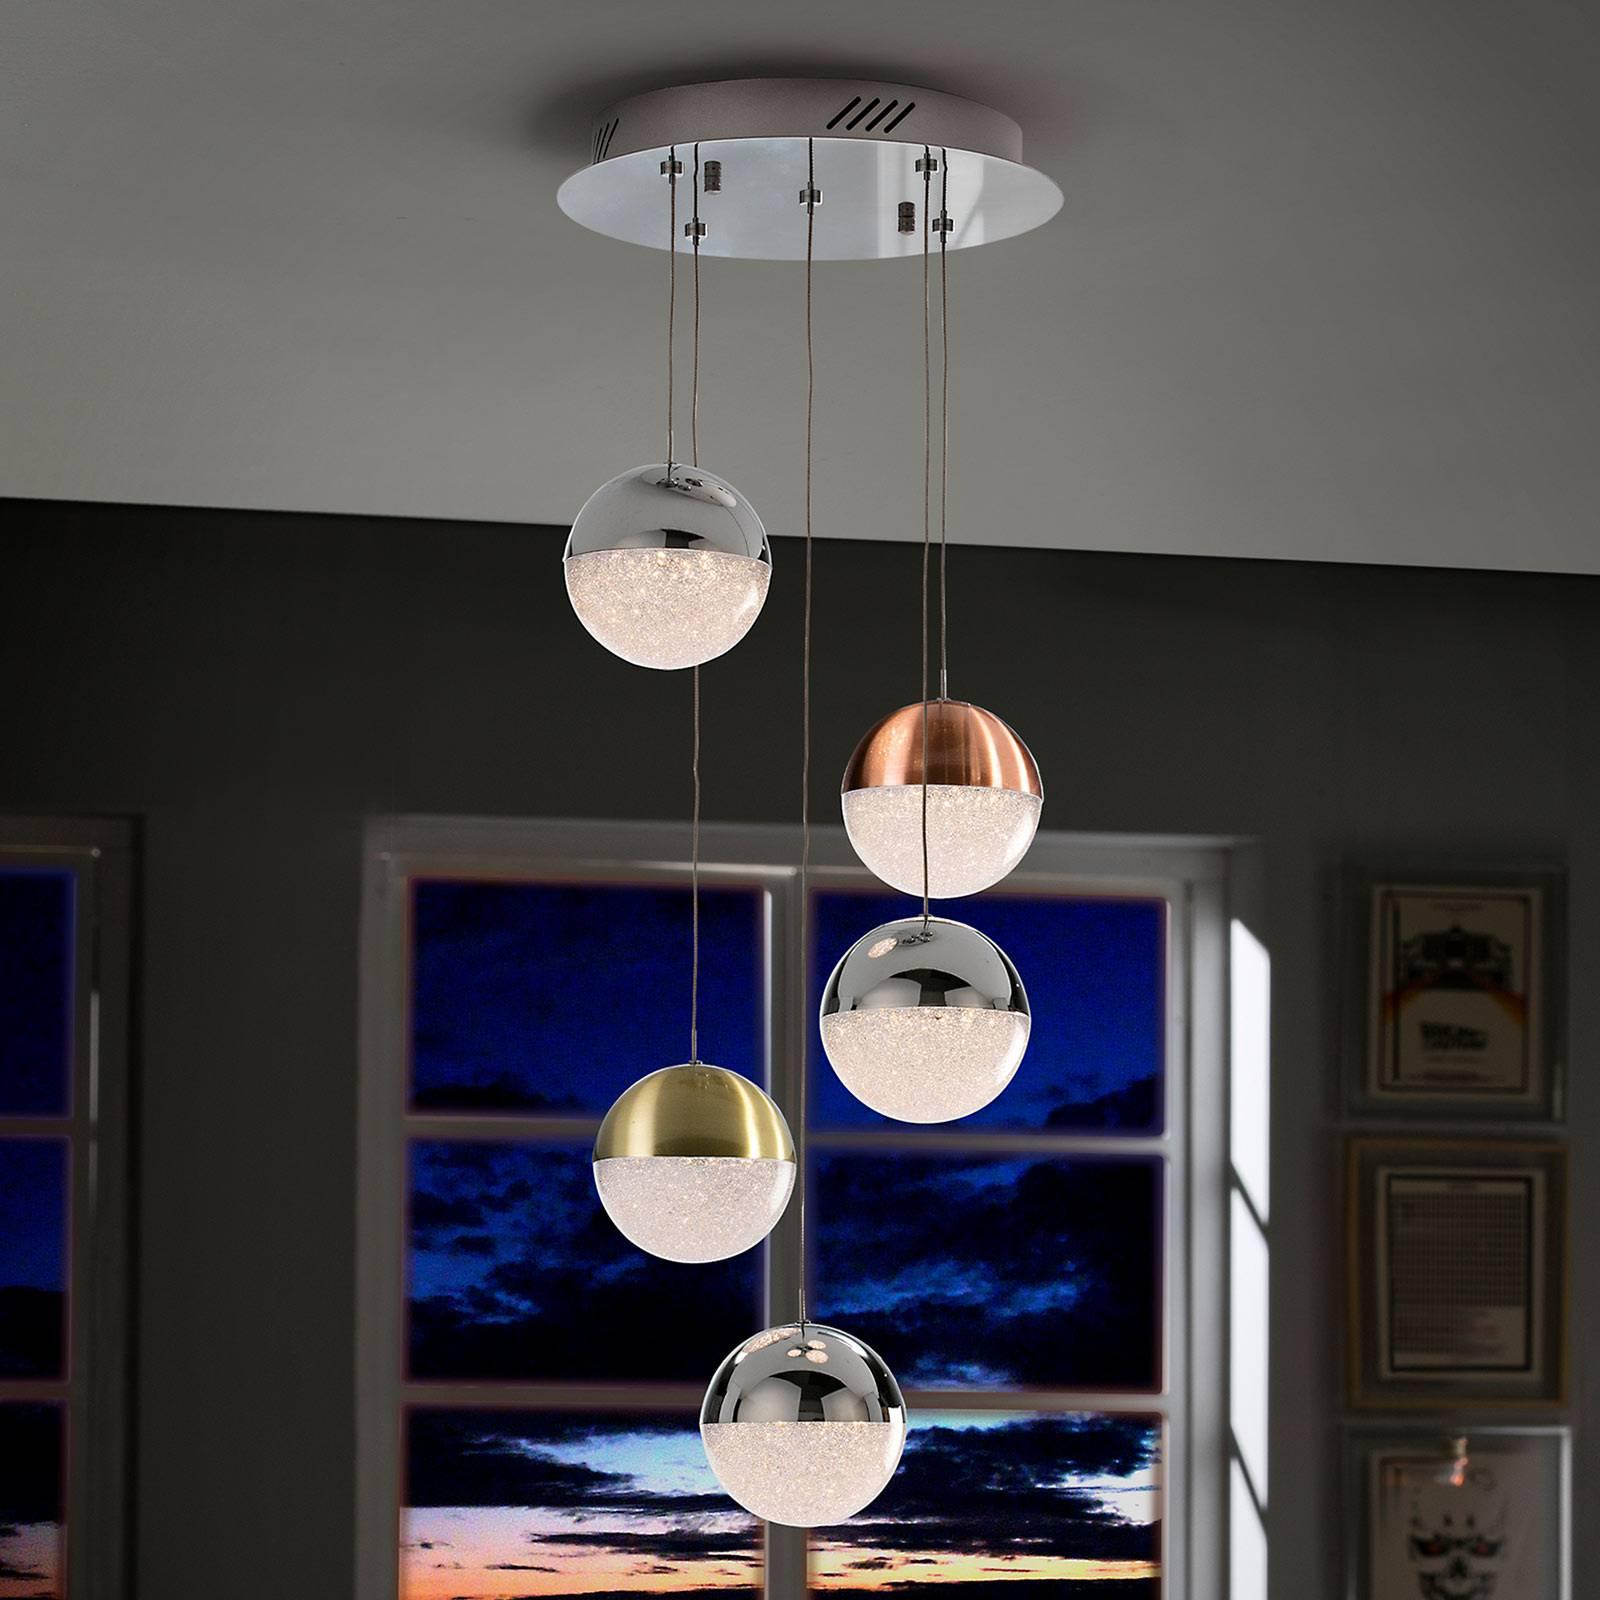 Lampa wisząca LED Sphere, multicolor, 5-punktowa